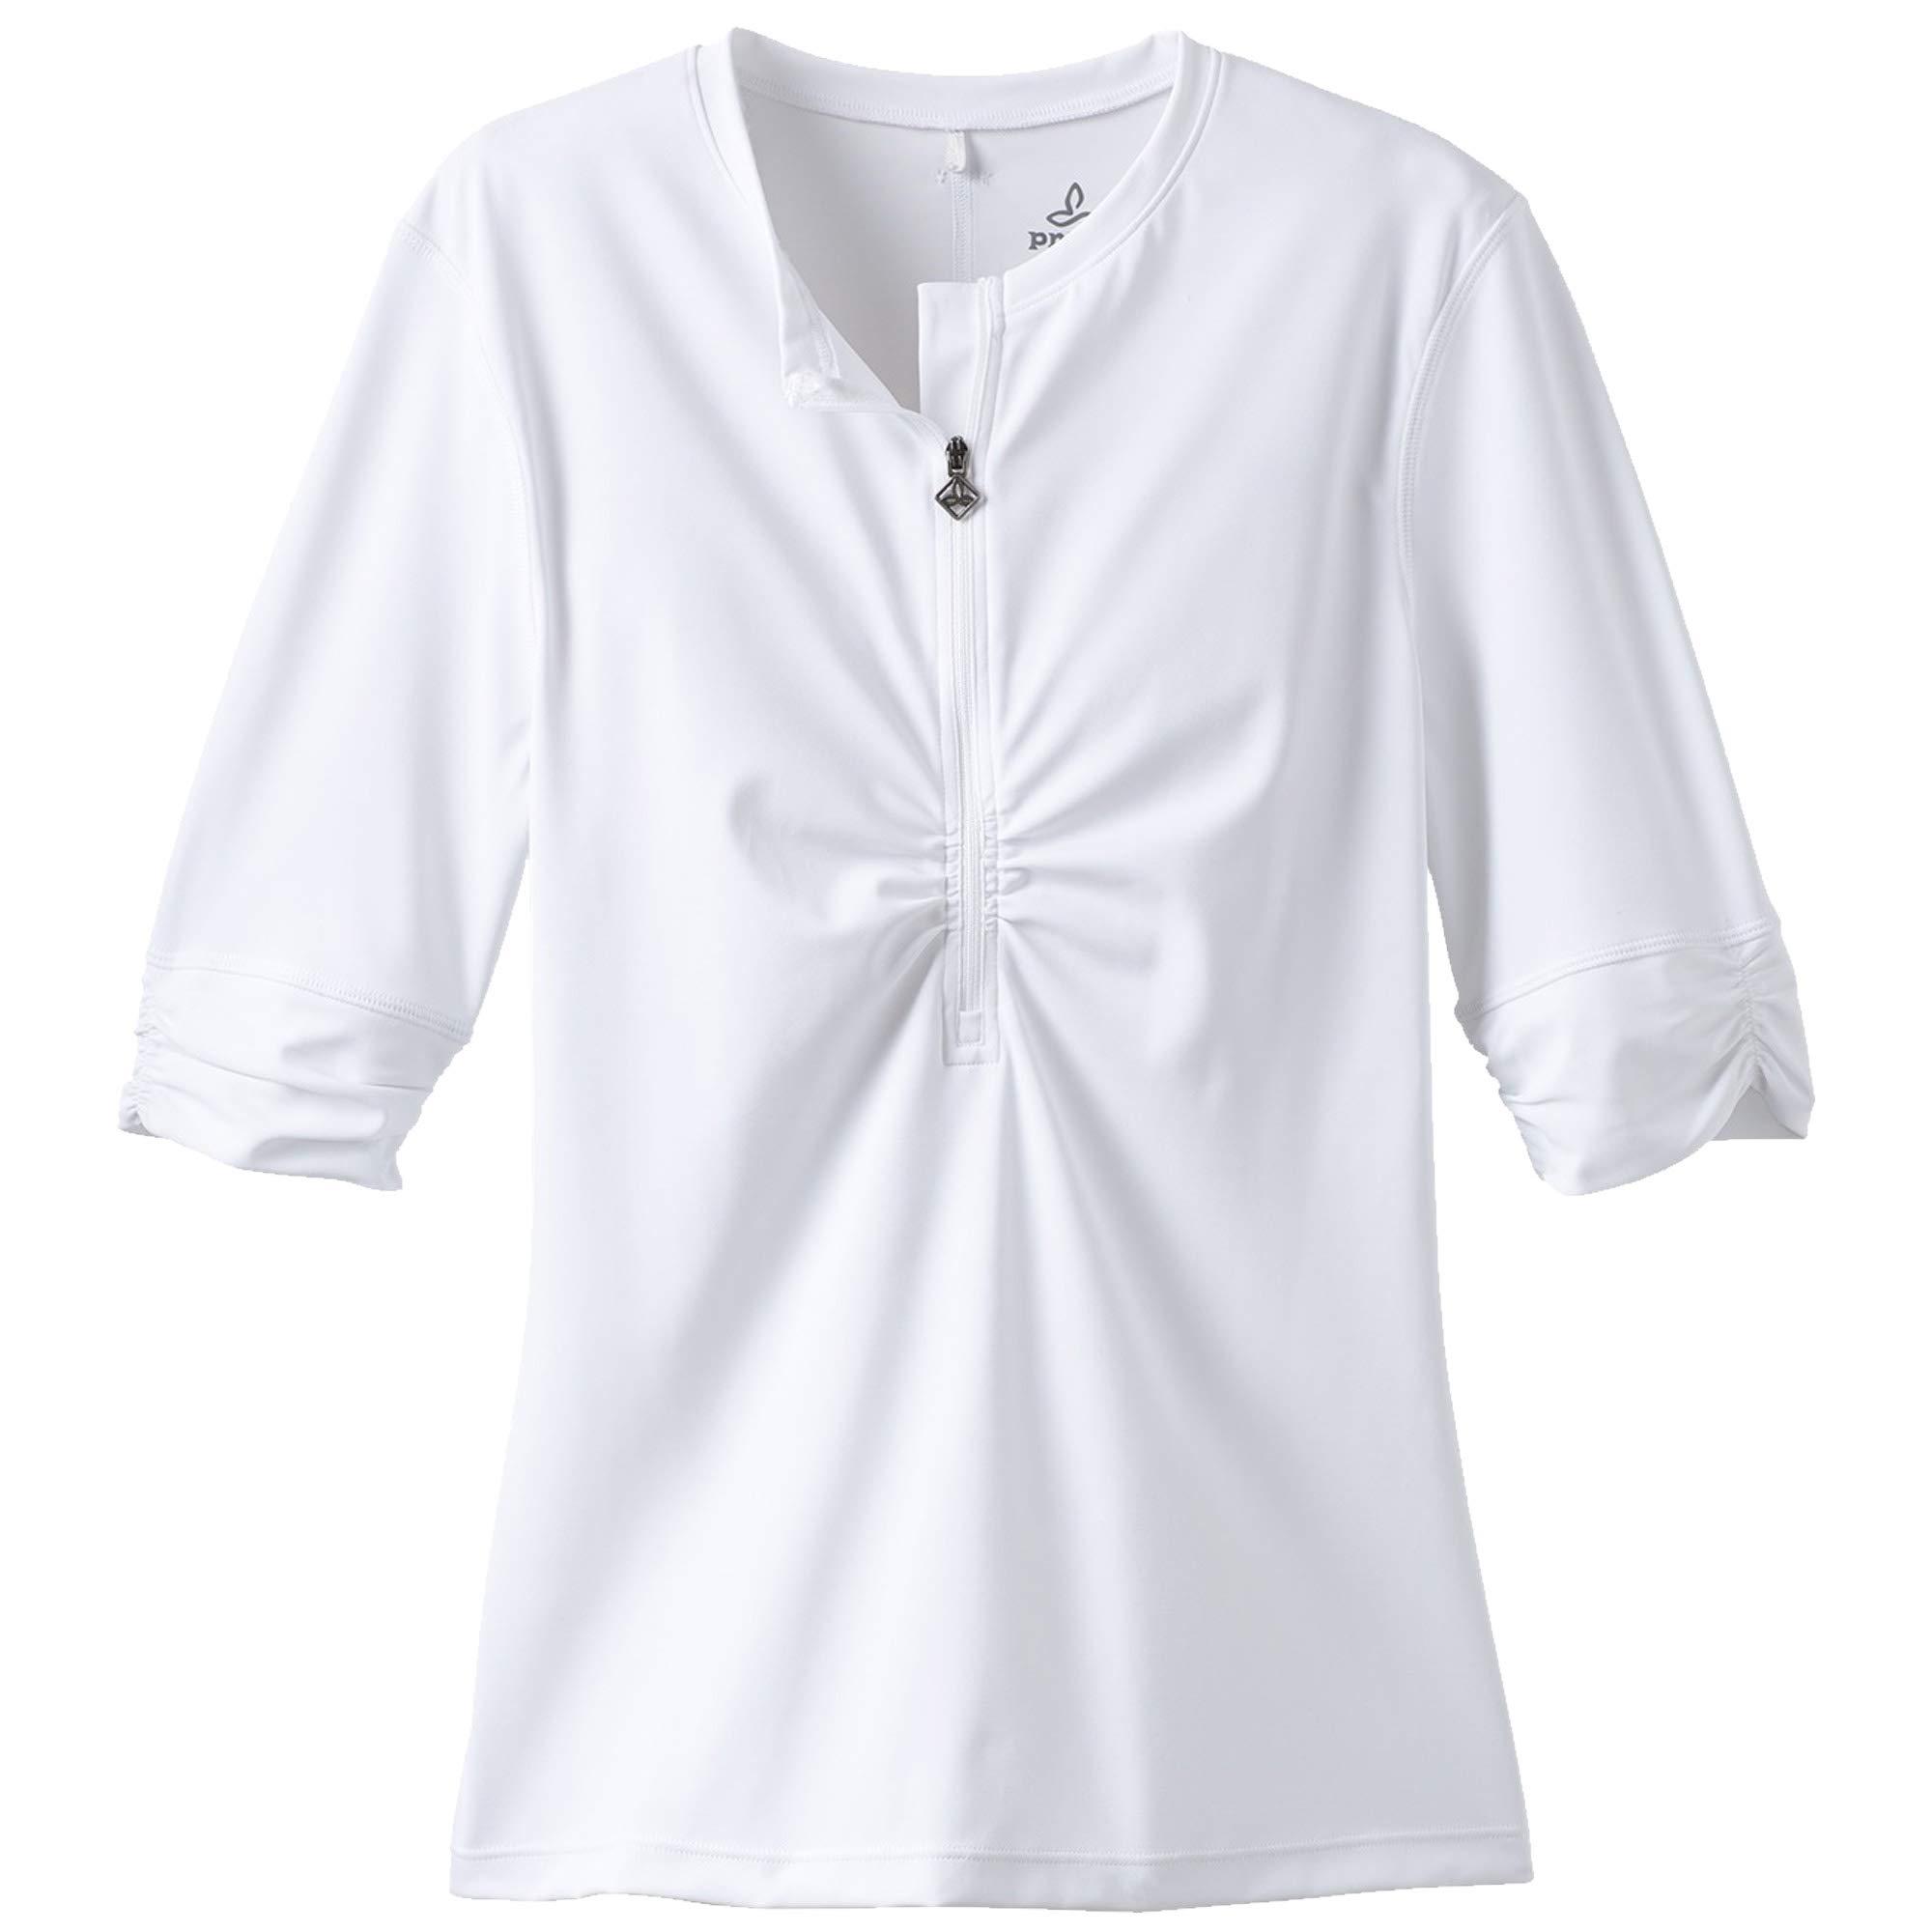 prAna Women's Perry Short Sleeve Sun Top, White, Small